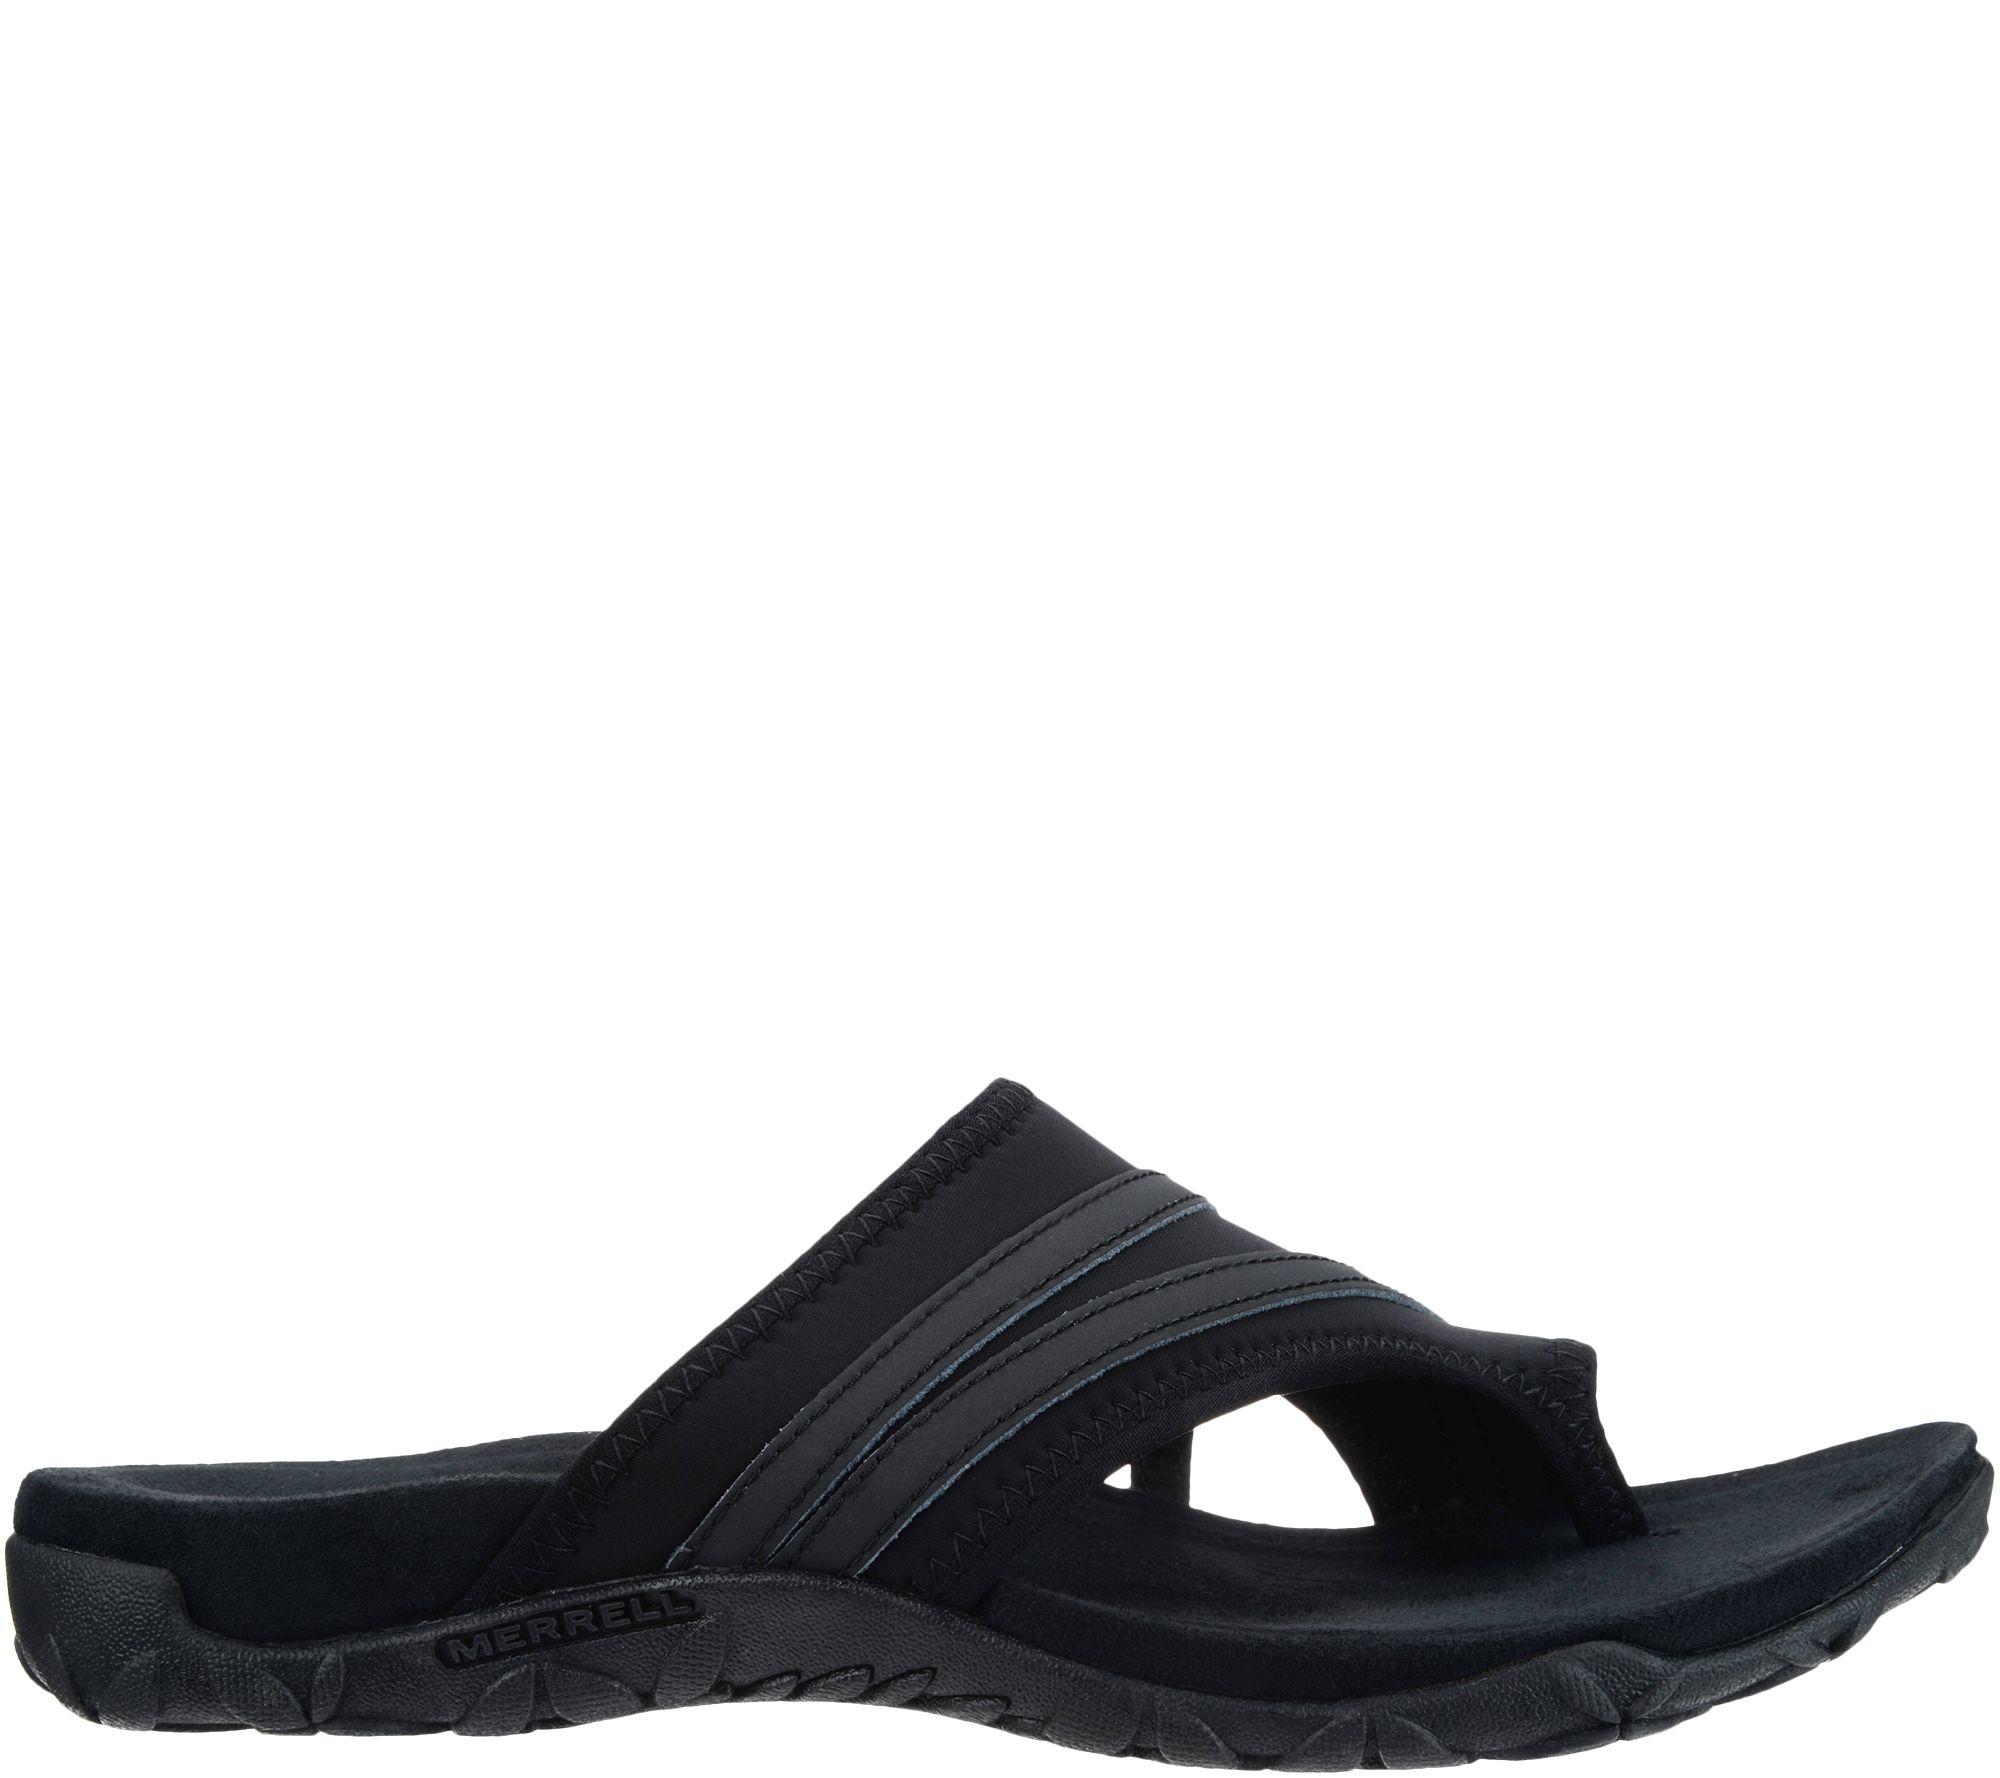 c988454f79b4 Merrell Leather   Textile Sandals - Terran Ari Wrap - Page 1 — QVC.com